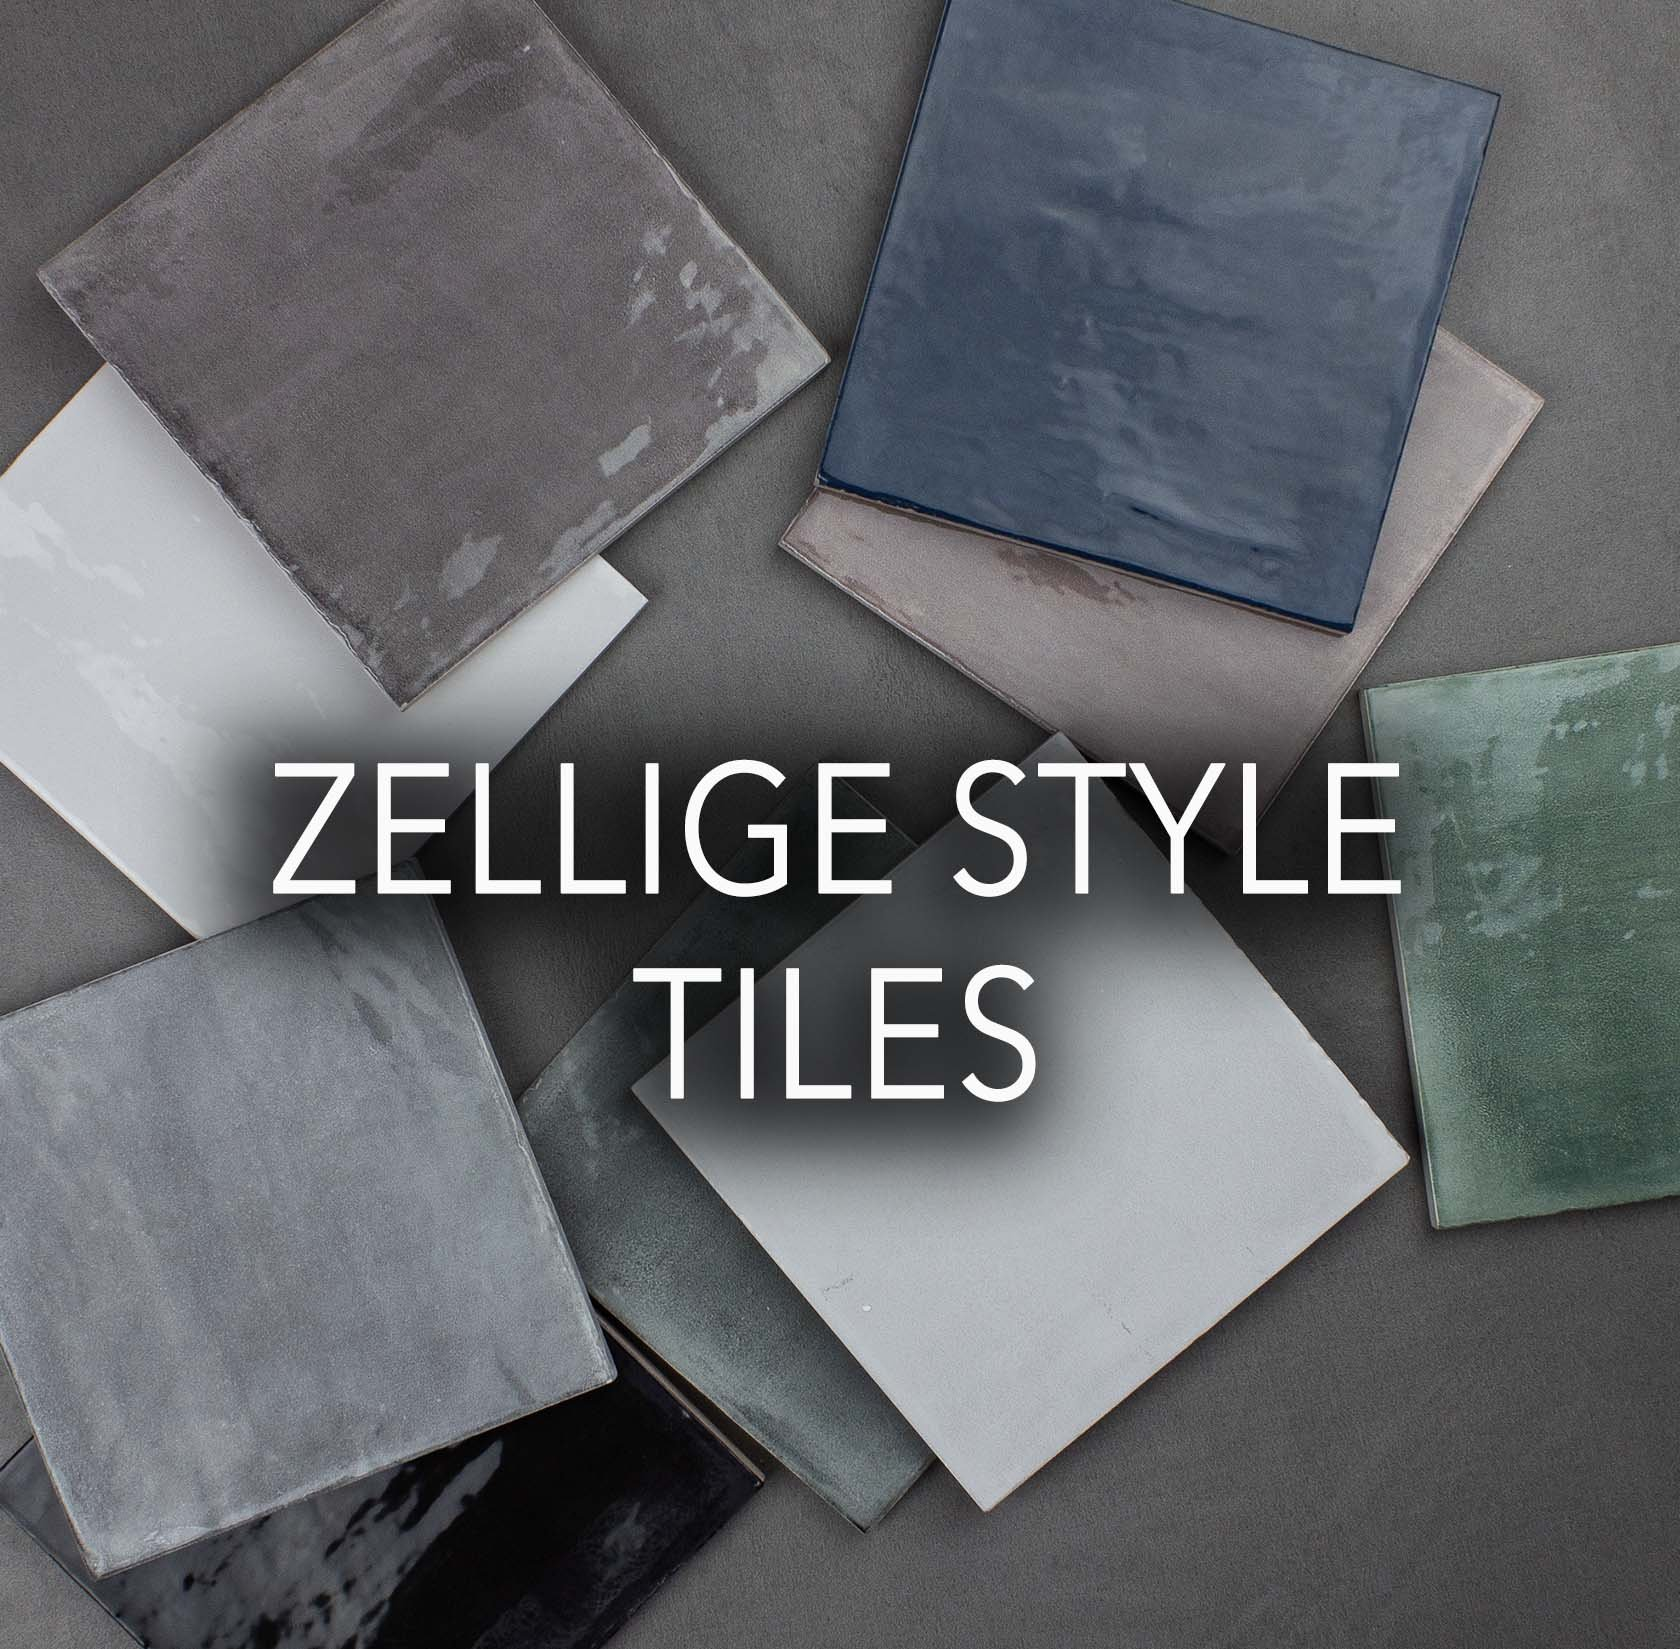 Zellige Style Ceramic tiles